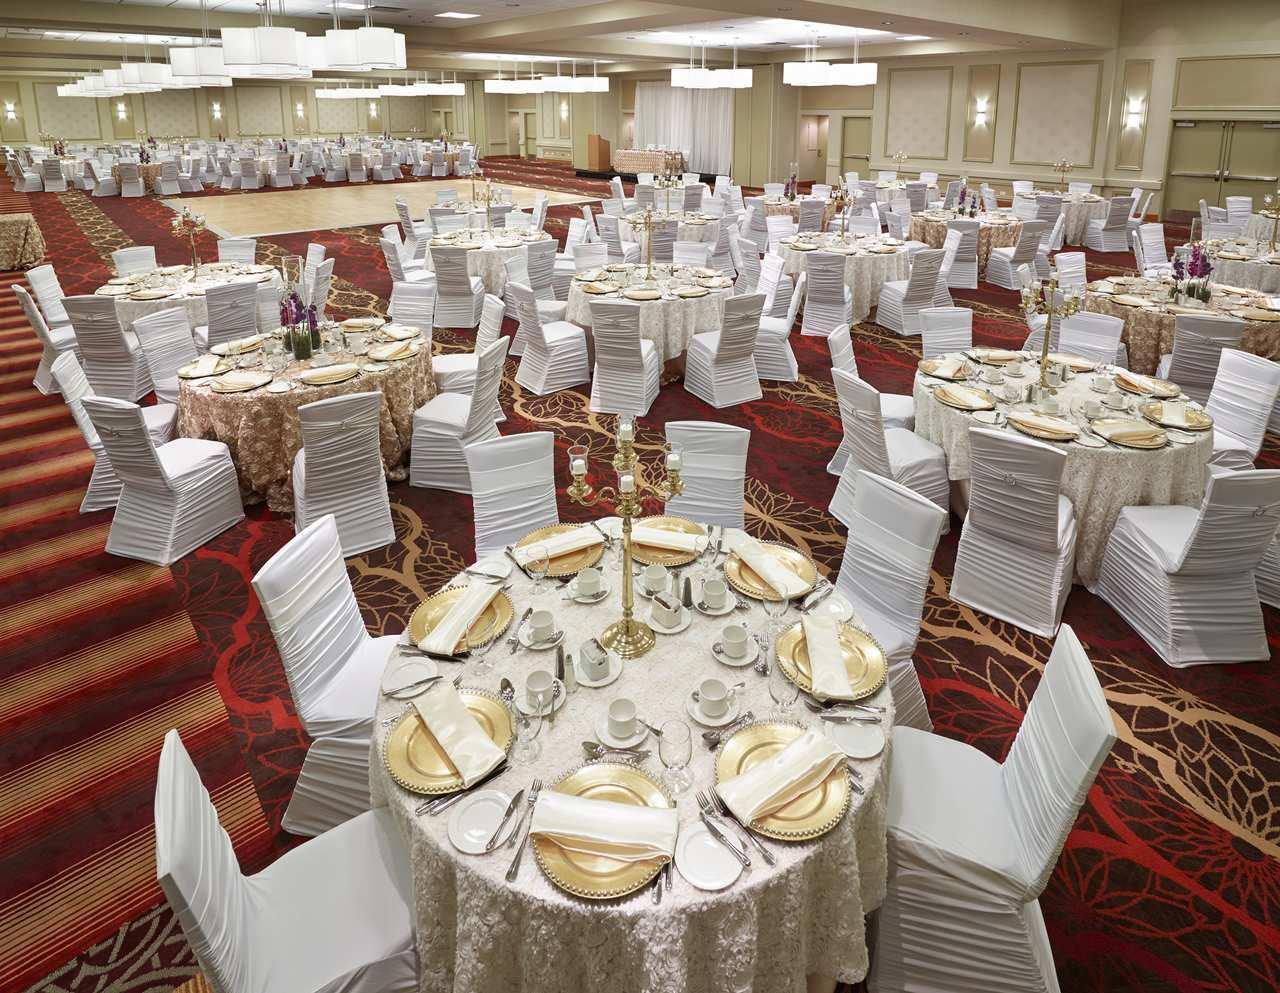 DoubleTree by Hilton Hotel West Edmonton in Edmonton: Ballroom Wedding Setup